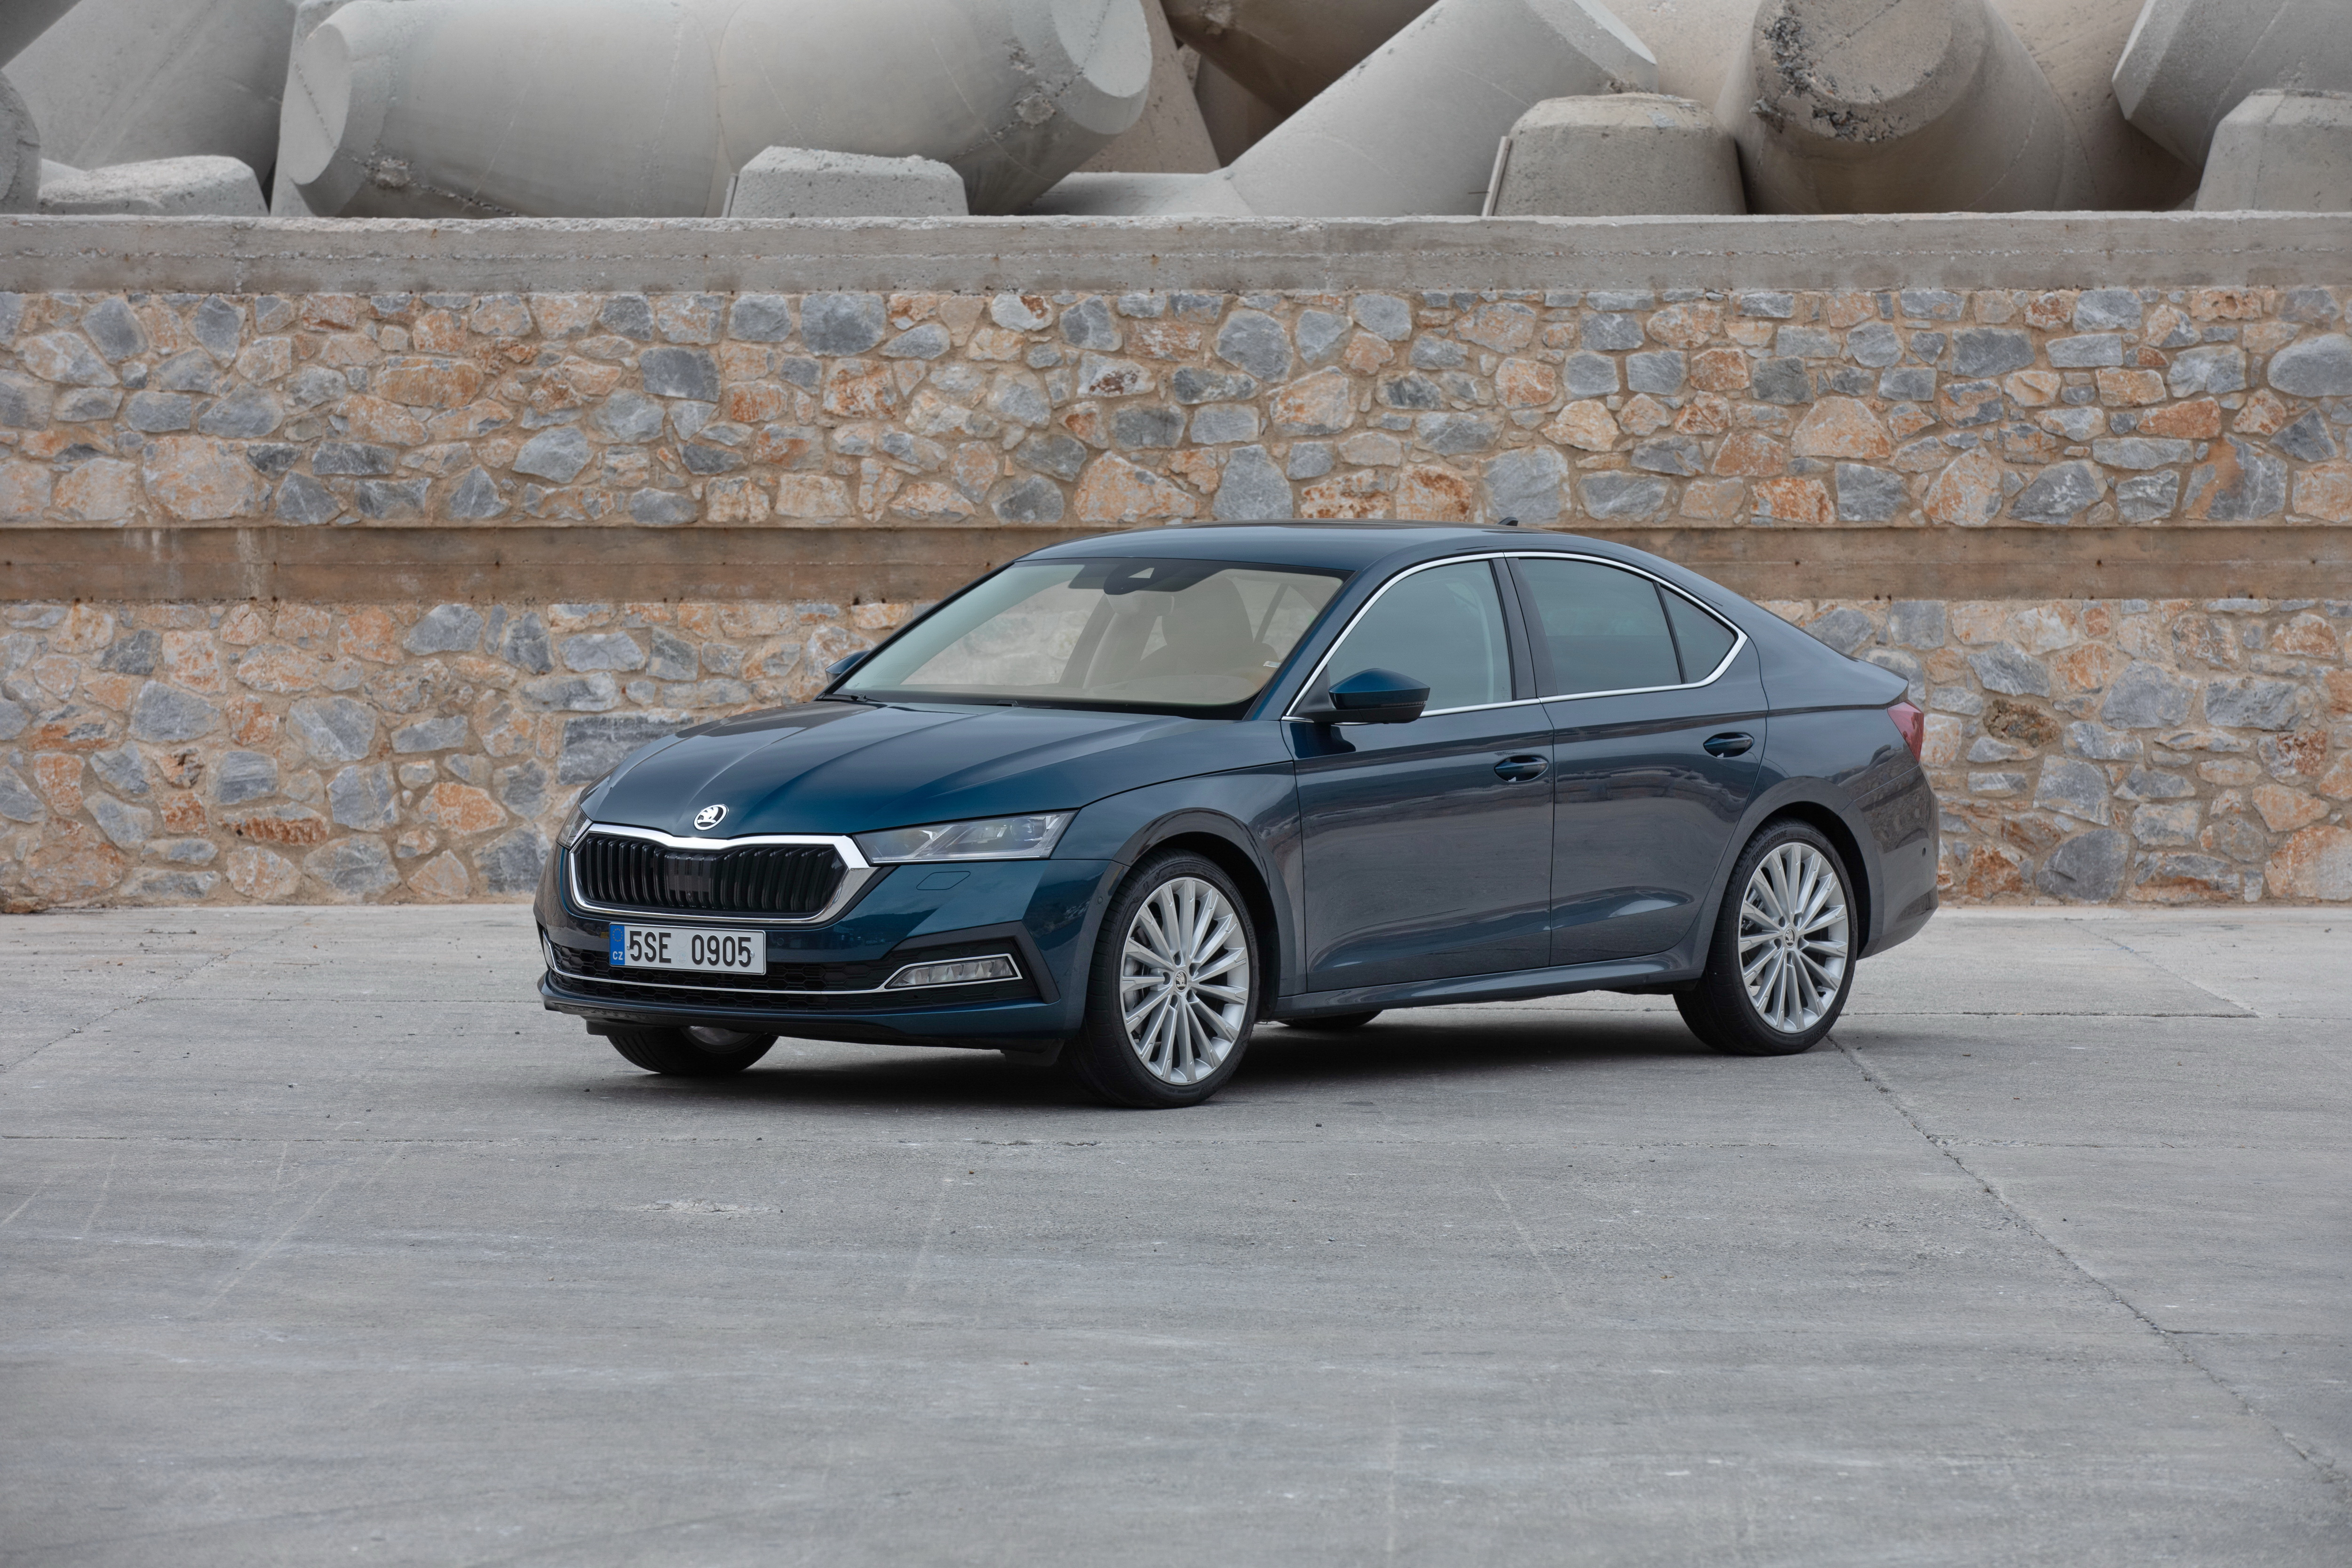 The all-new SKODA OCTAVIA: spacious, practical and elegant like a coupé - Image 2